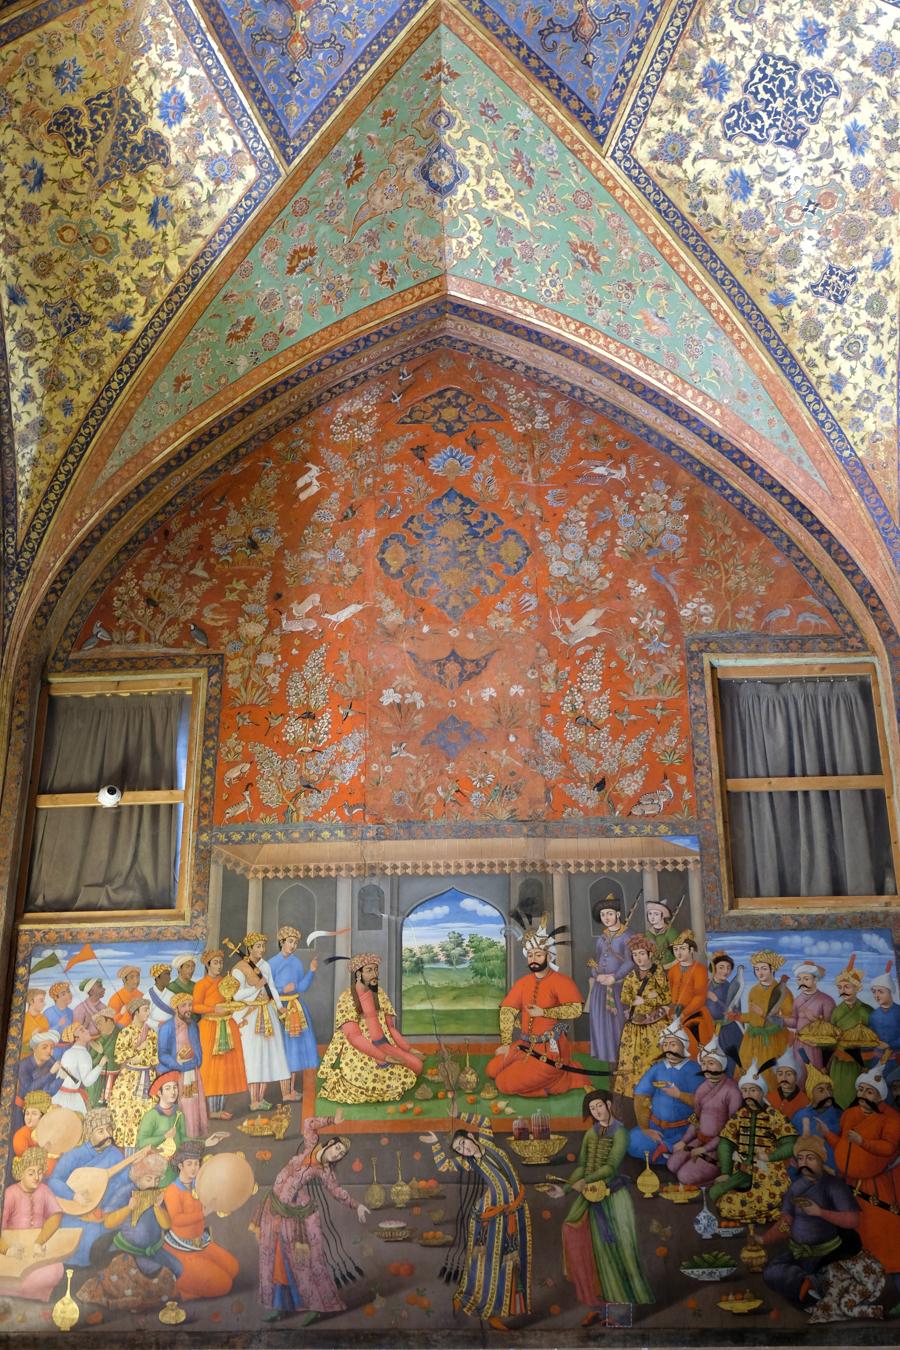 Esfahan KAKH-E CHEHL SOTUN painting